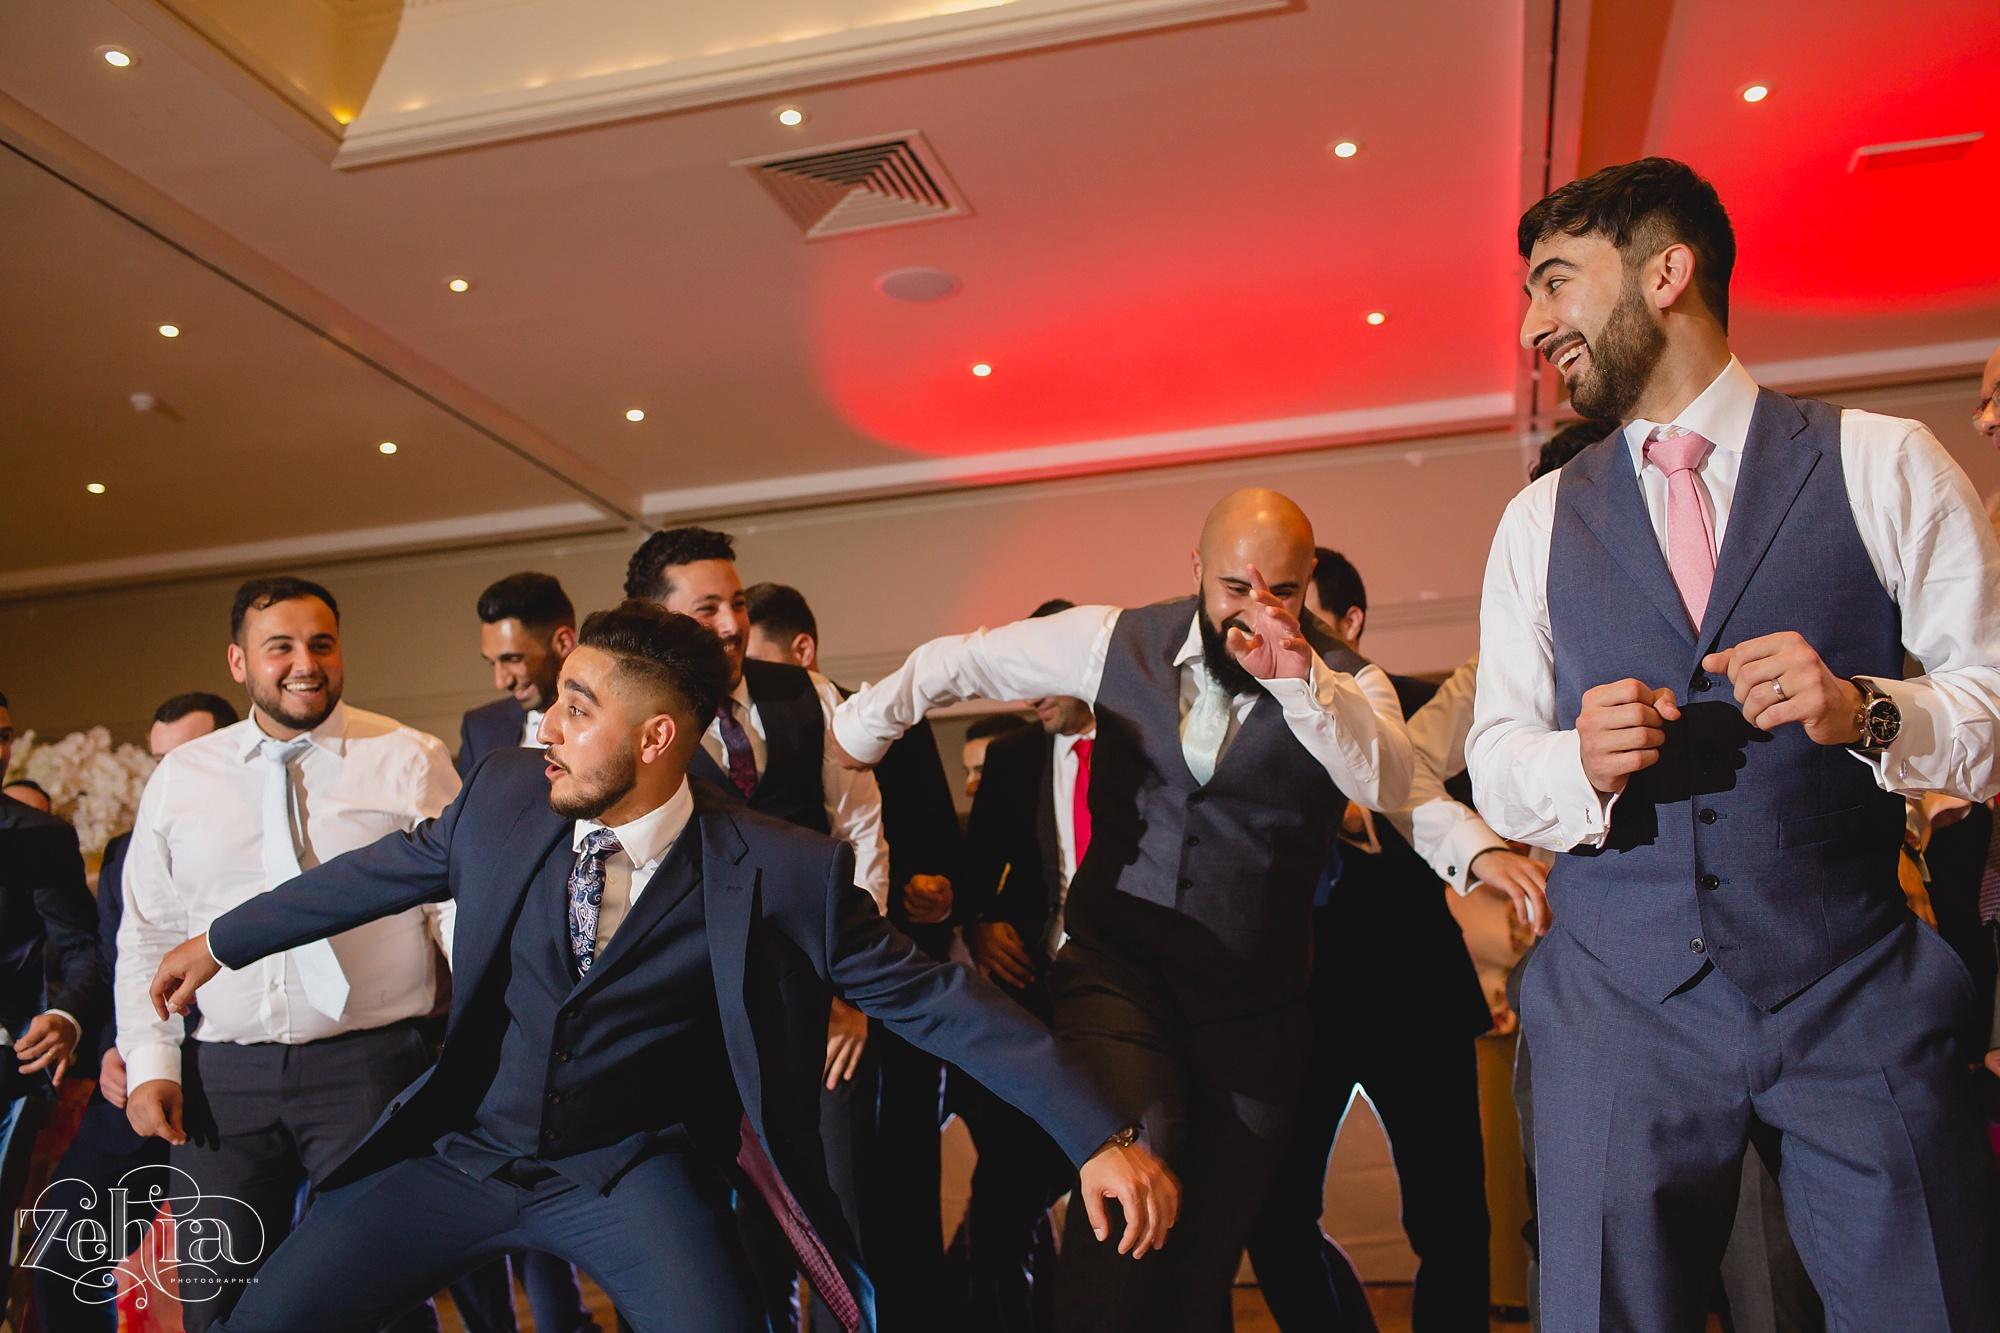 zehra photographer mere cheshire wedding_0060.jpg